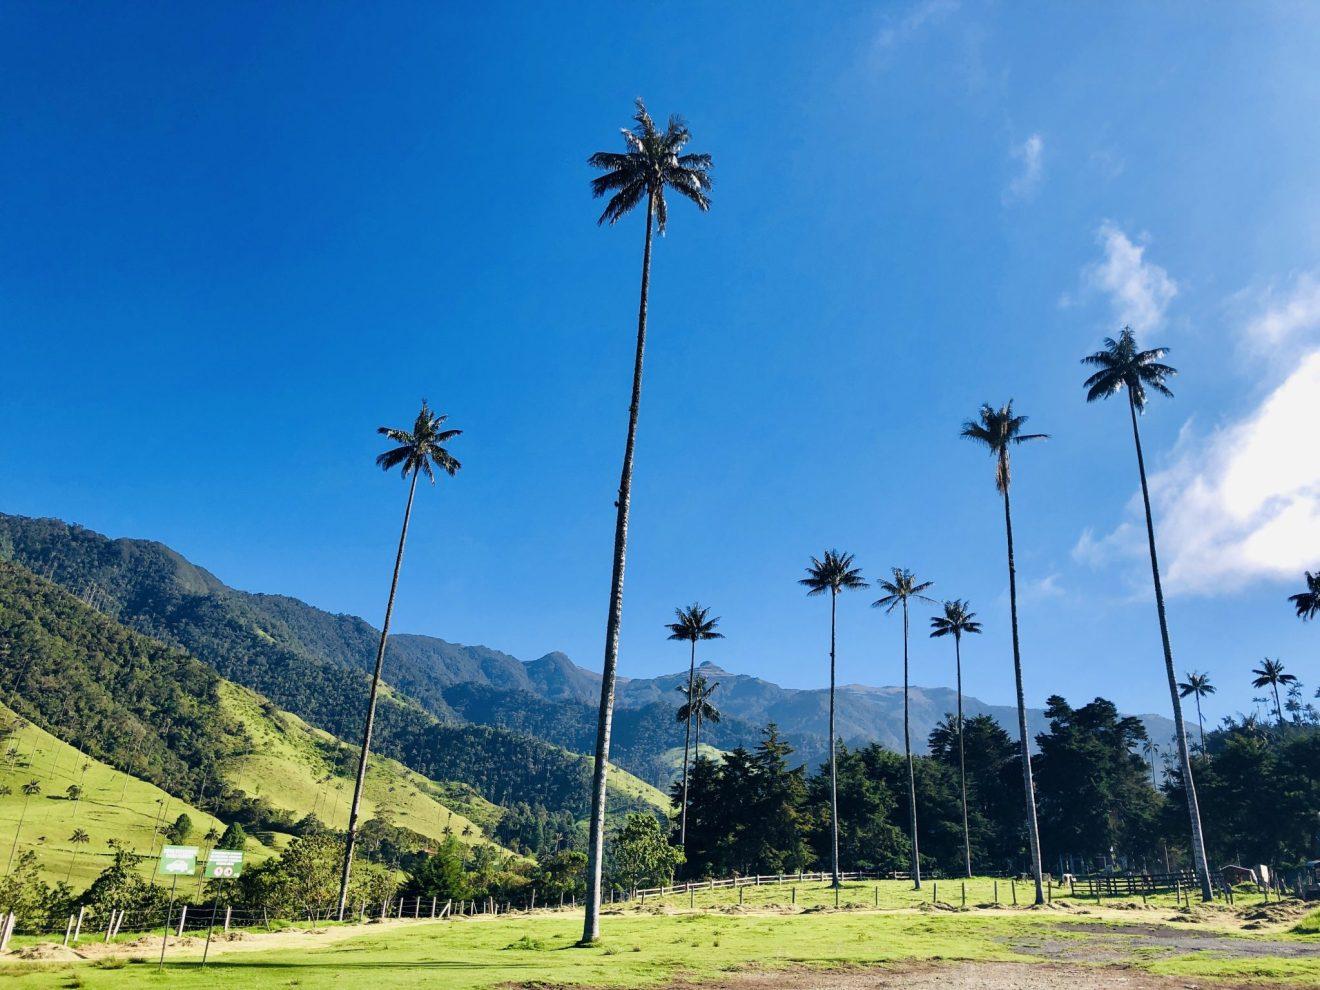 Bosques de las Palmas